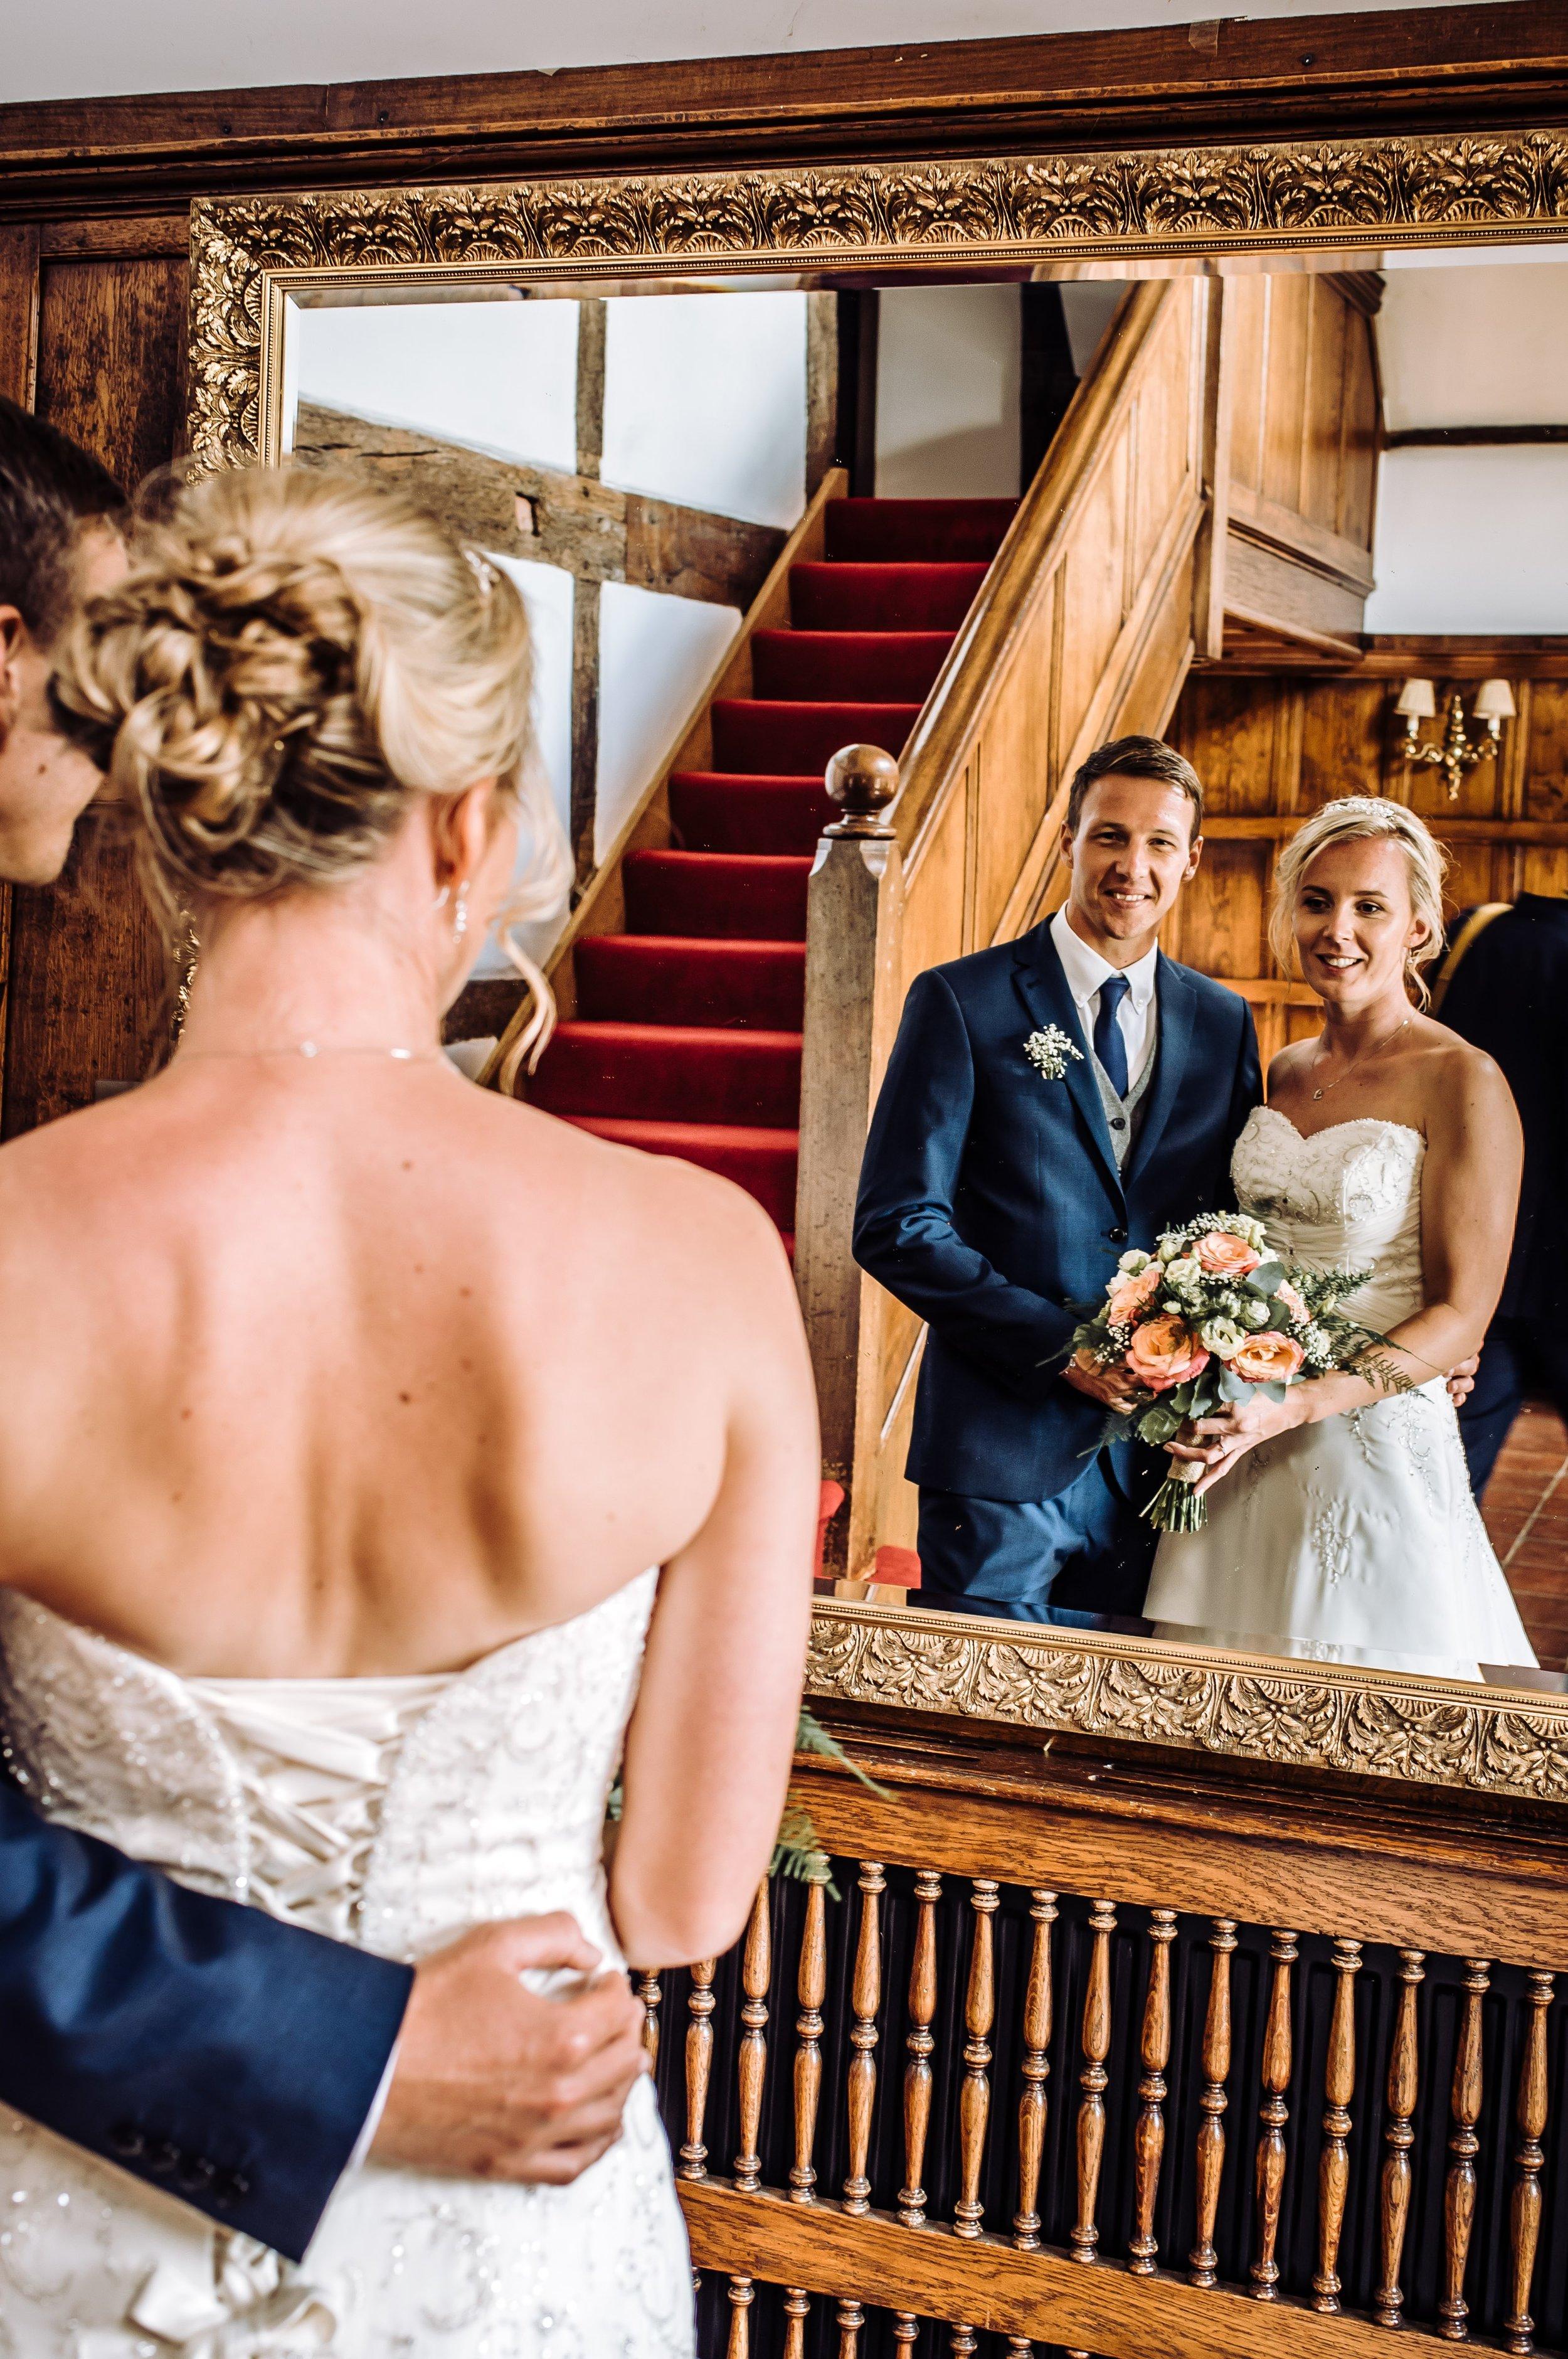 Vintage Wedding - East Sussex Wedding Photographer_0062.jpg